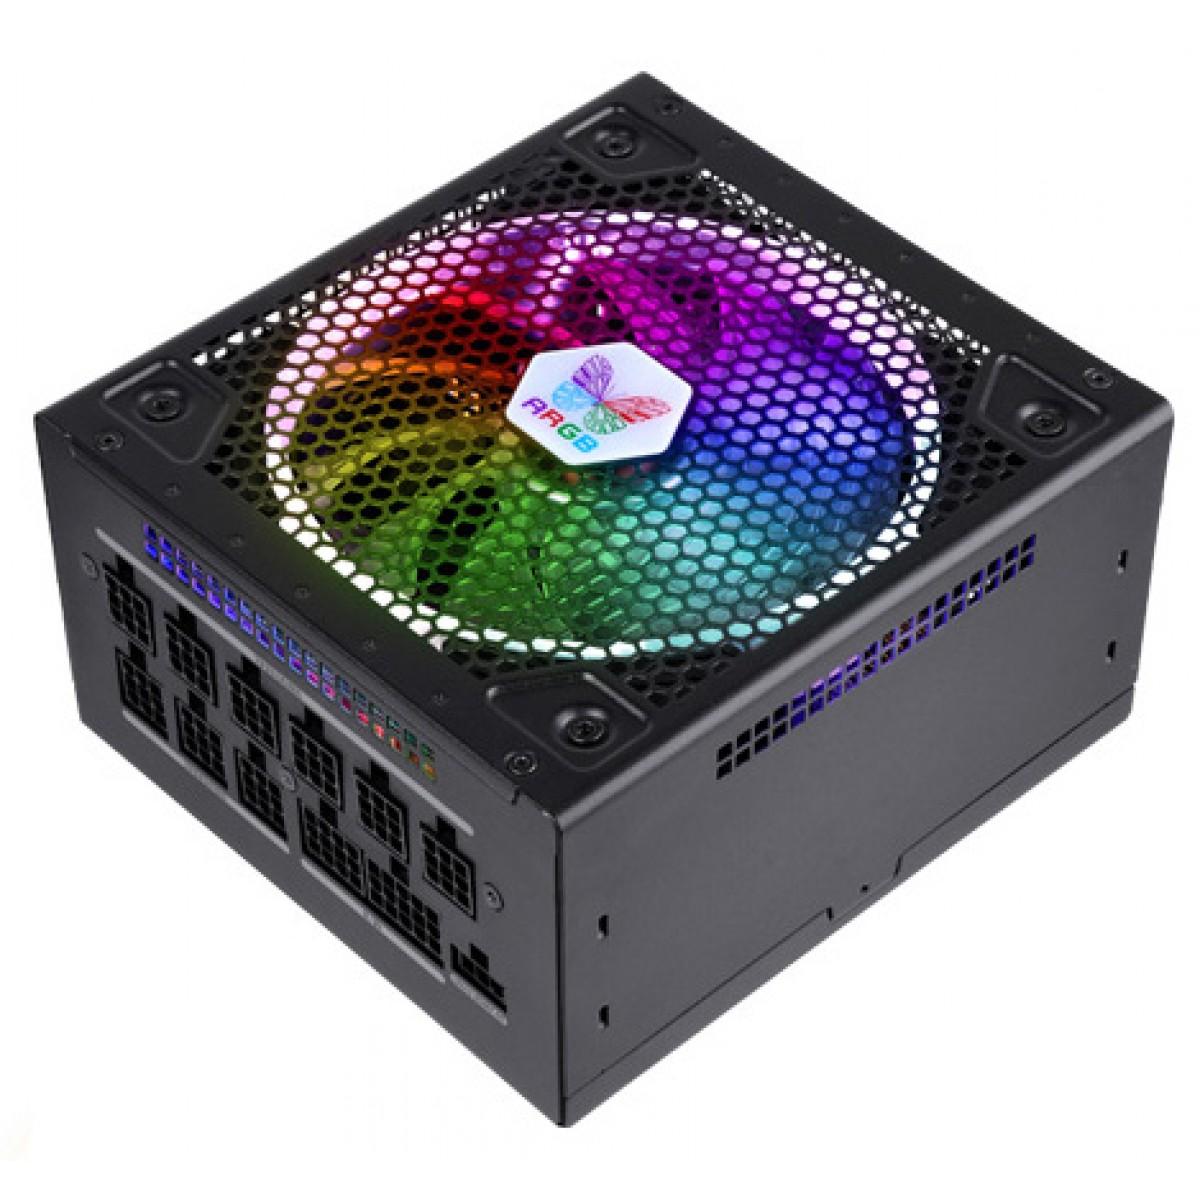 Fonte Super Flower LEADEX III ARGB PRO 850W, 80 Plus Gold, PFC Ativo, Full Modular, SF-850F14RG V2.0